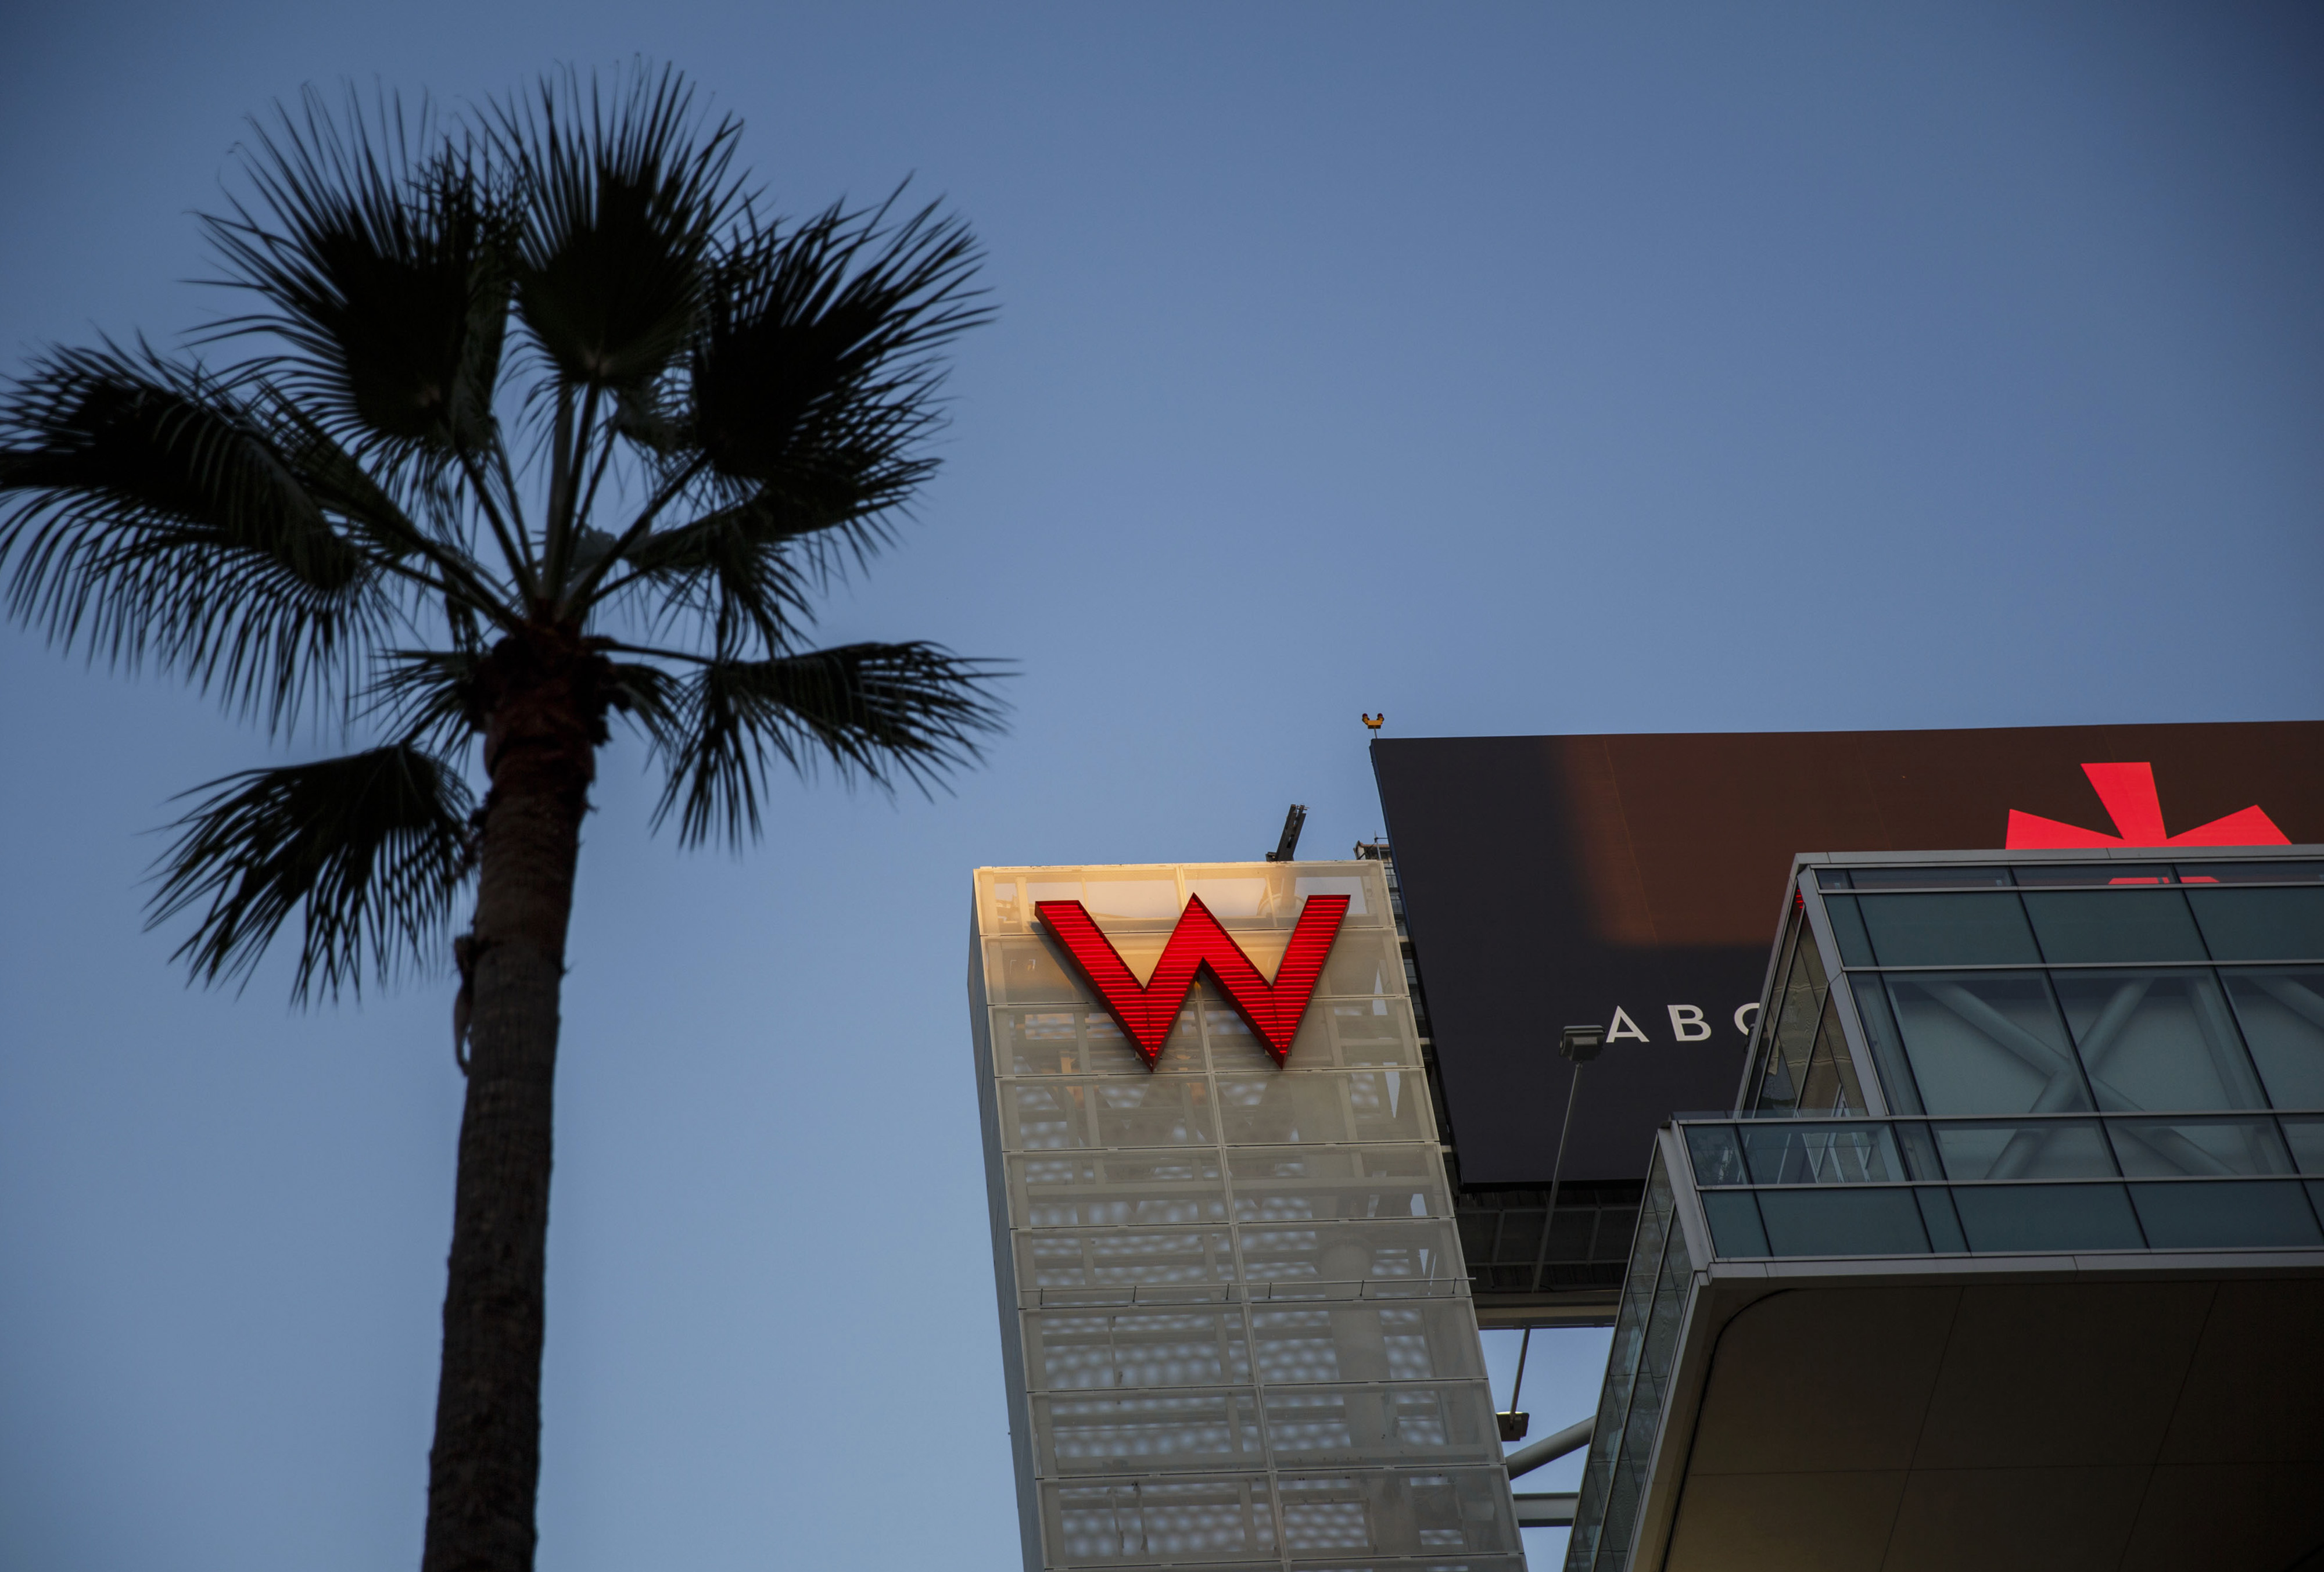 Starwood Hotels & Resorts Locations Ahead Of Earnings Figures